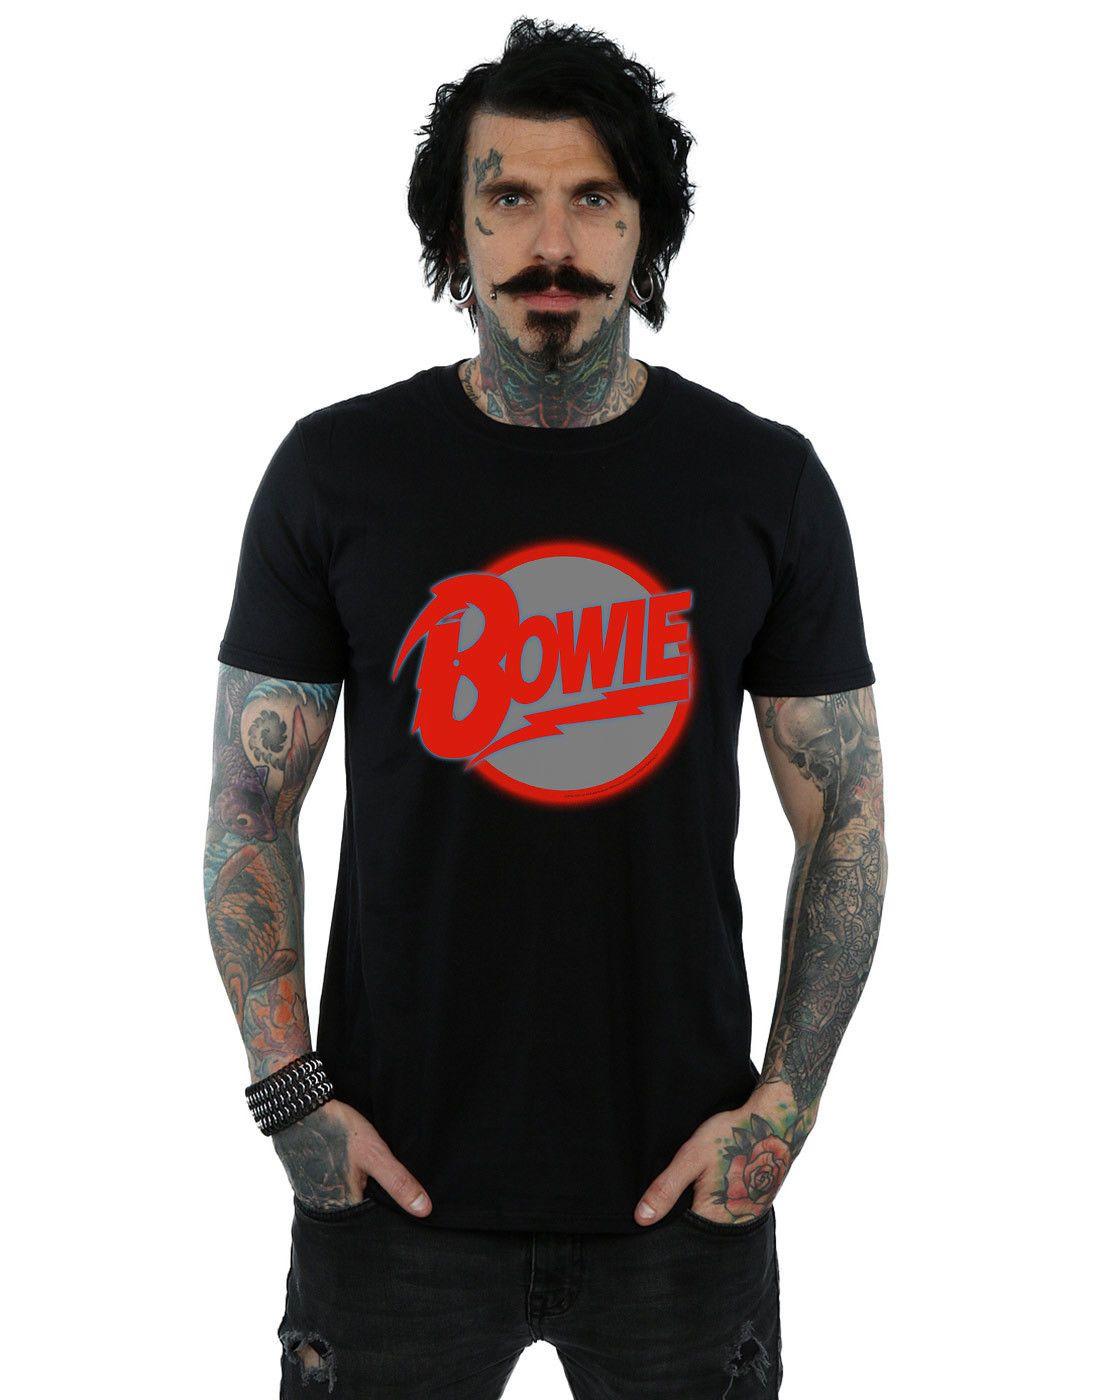 David Bowie Memorial Tee Fullprint Tshirt Men/'s New T-SHIRT